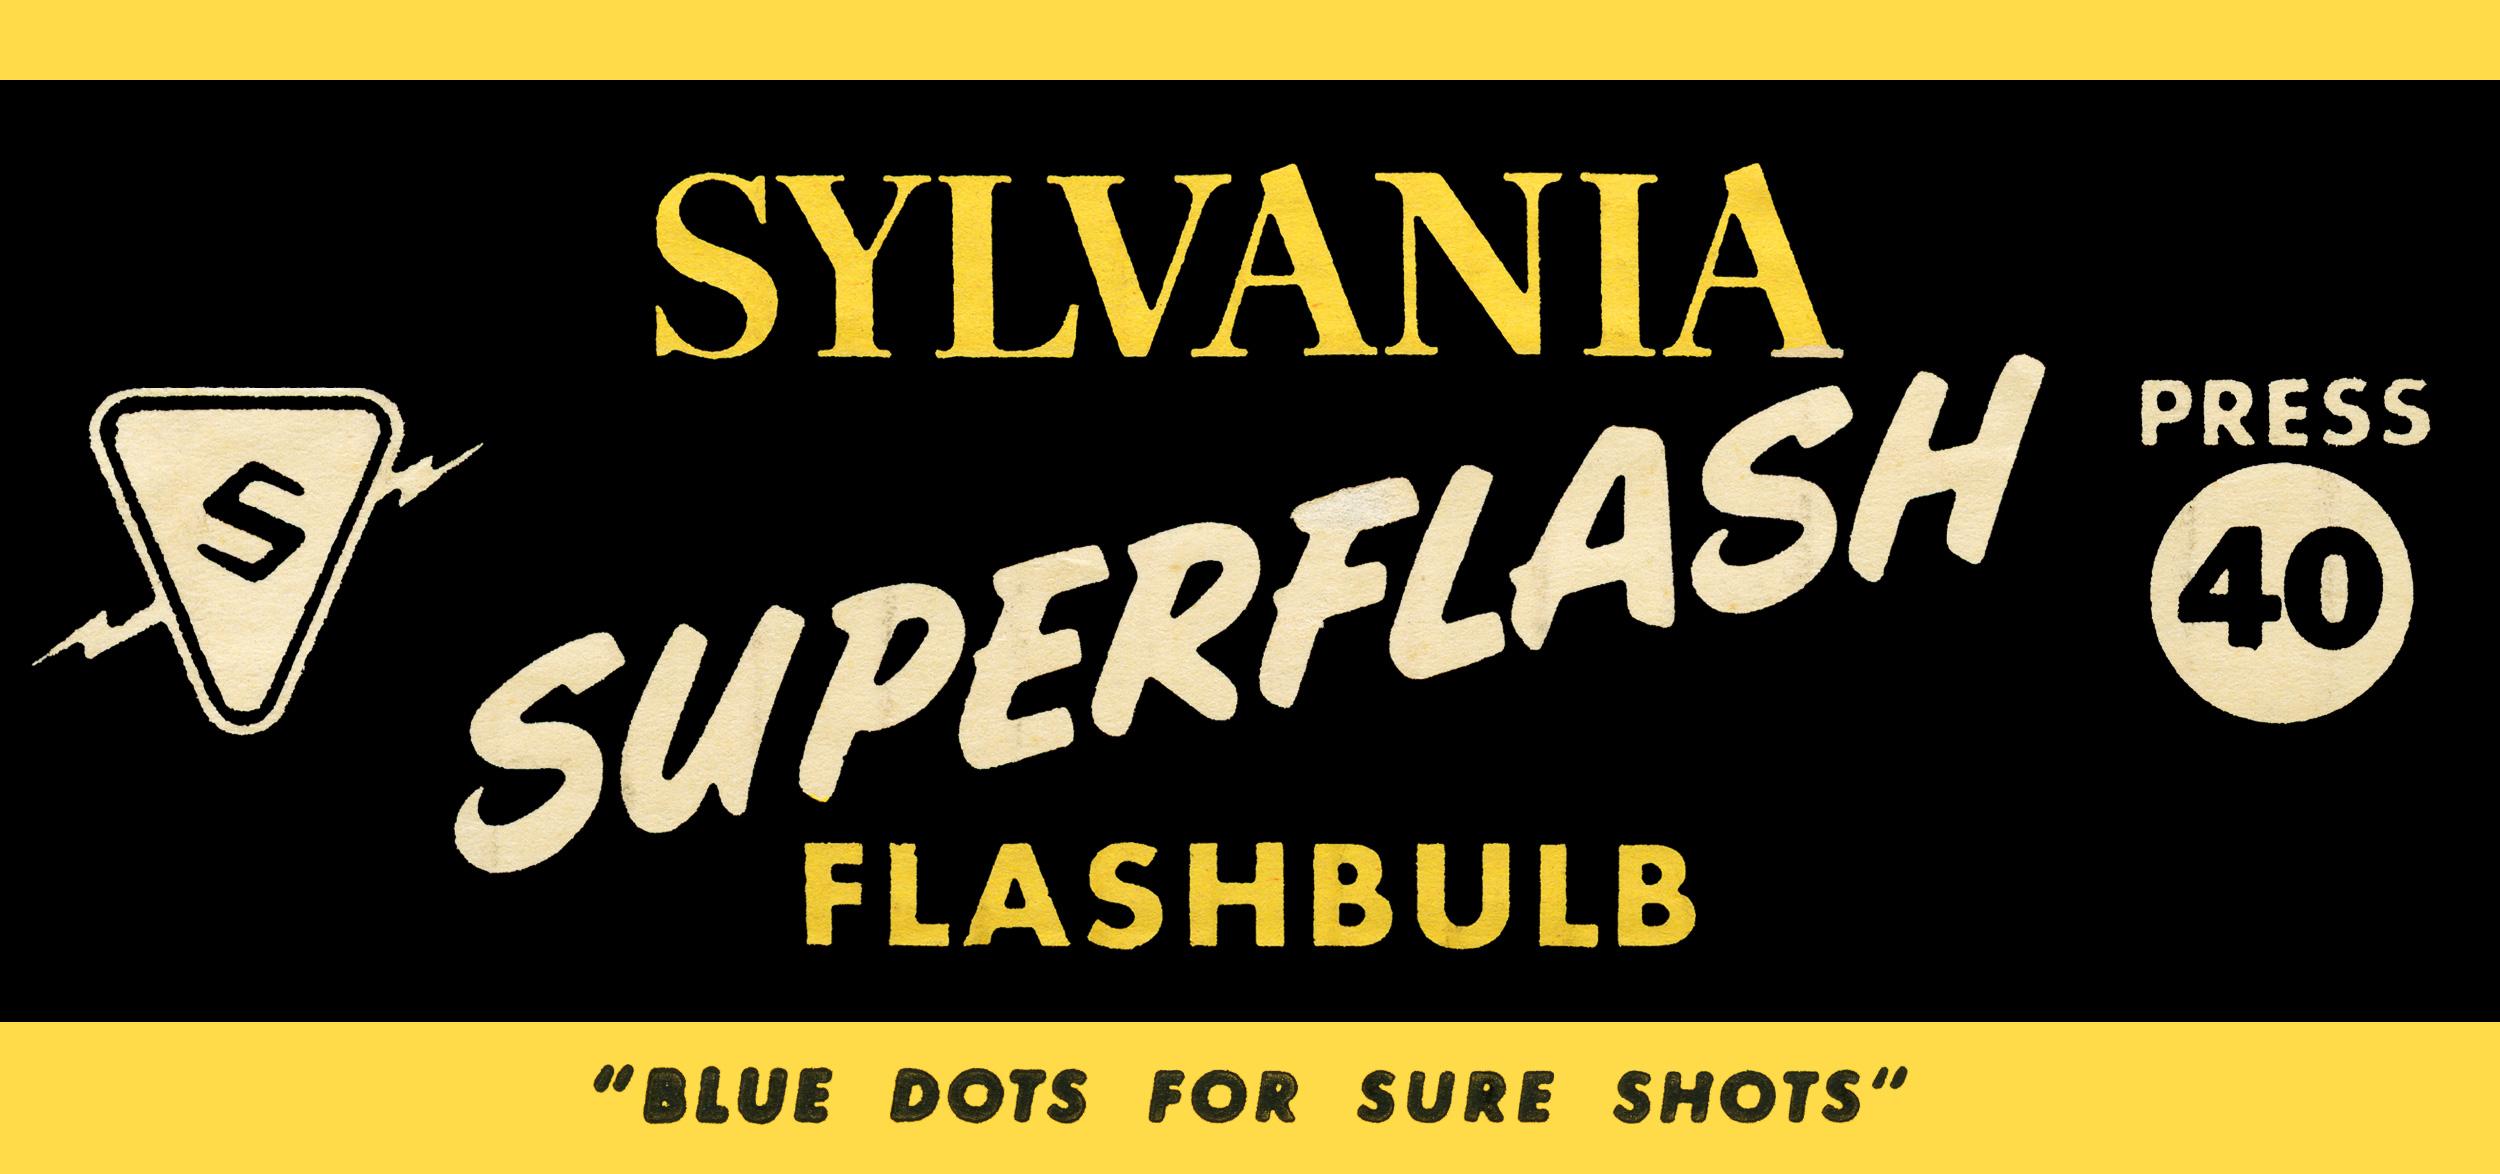 SylvaniaWabash40-header.jpg